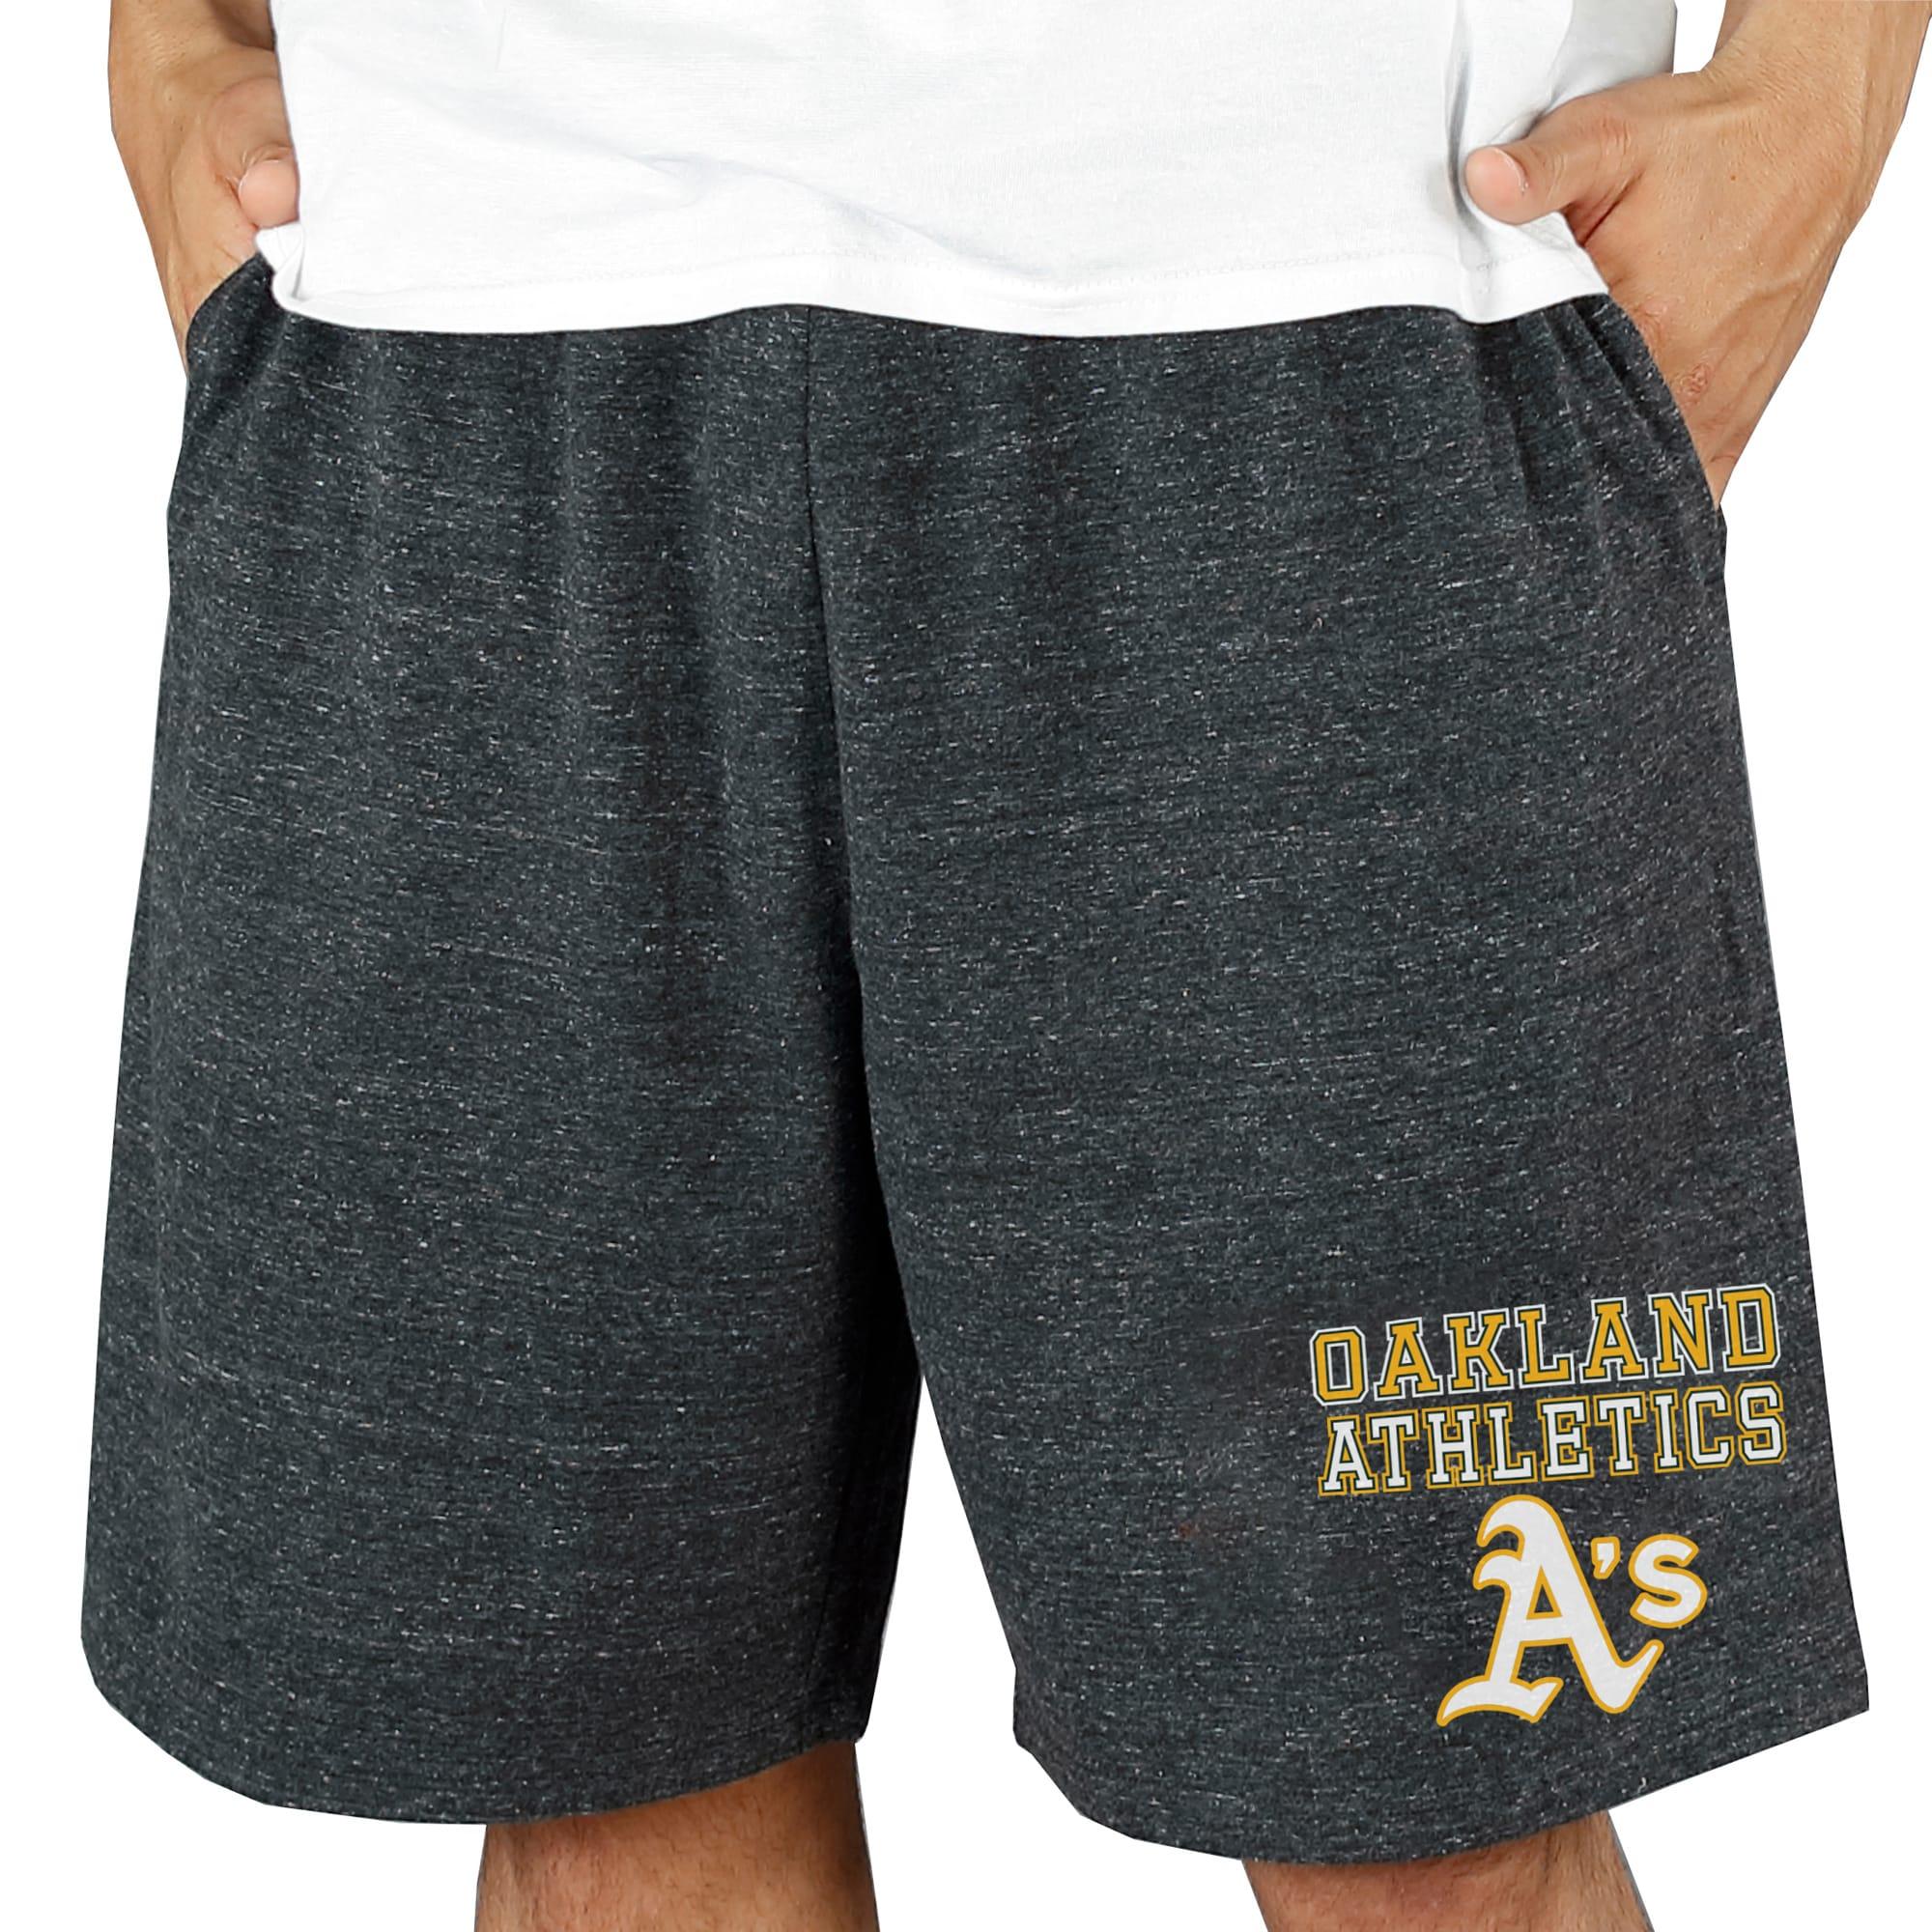 Oakland Athletics Concepts Sport Pitch Knit Jam Shorts - Charcoal